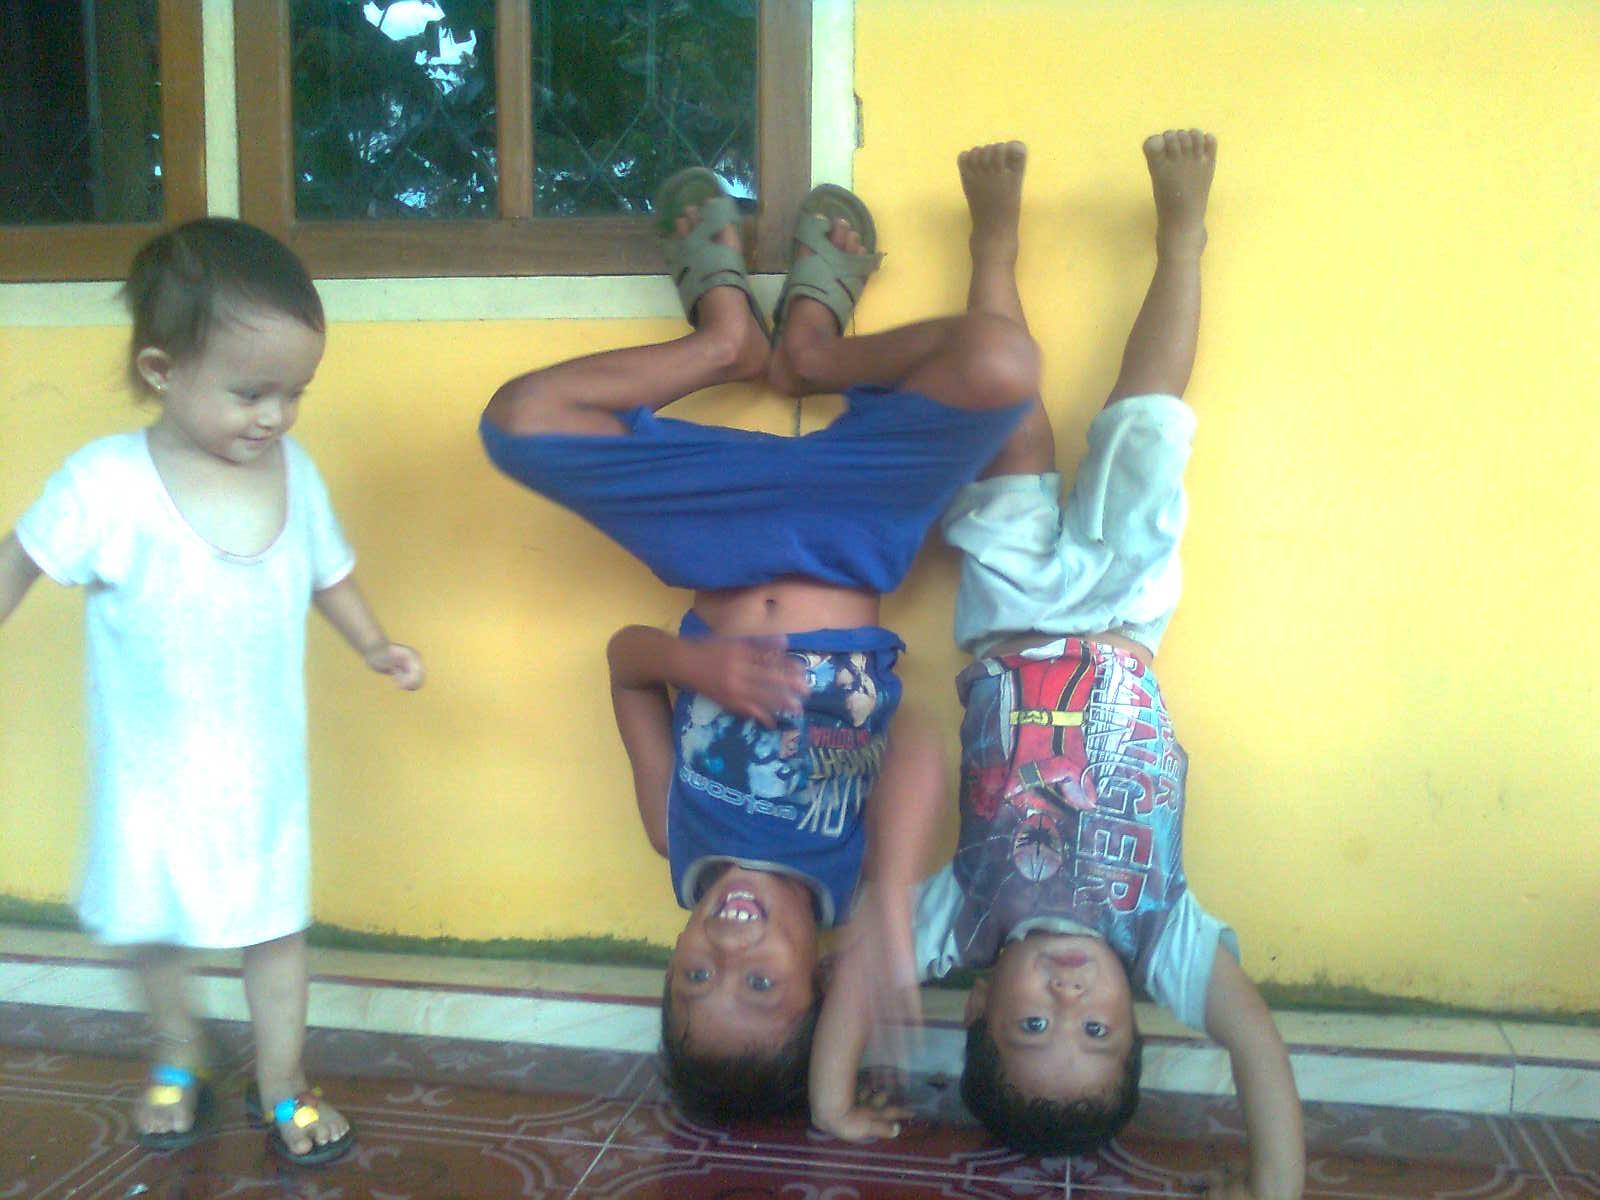 Anak Anak Lucu Dari Gorontalo 1 NasihatGuruku